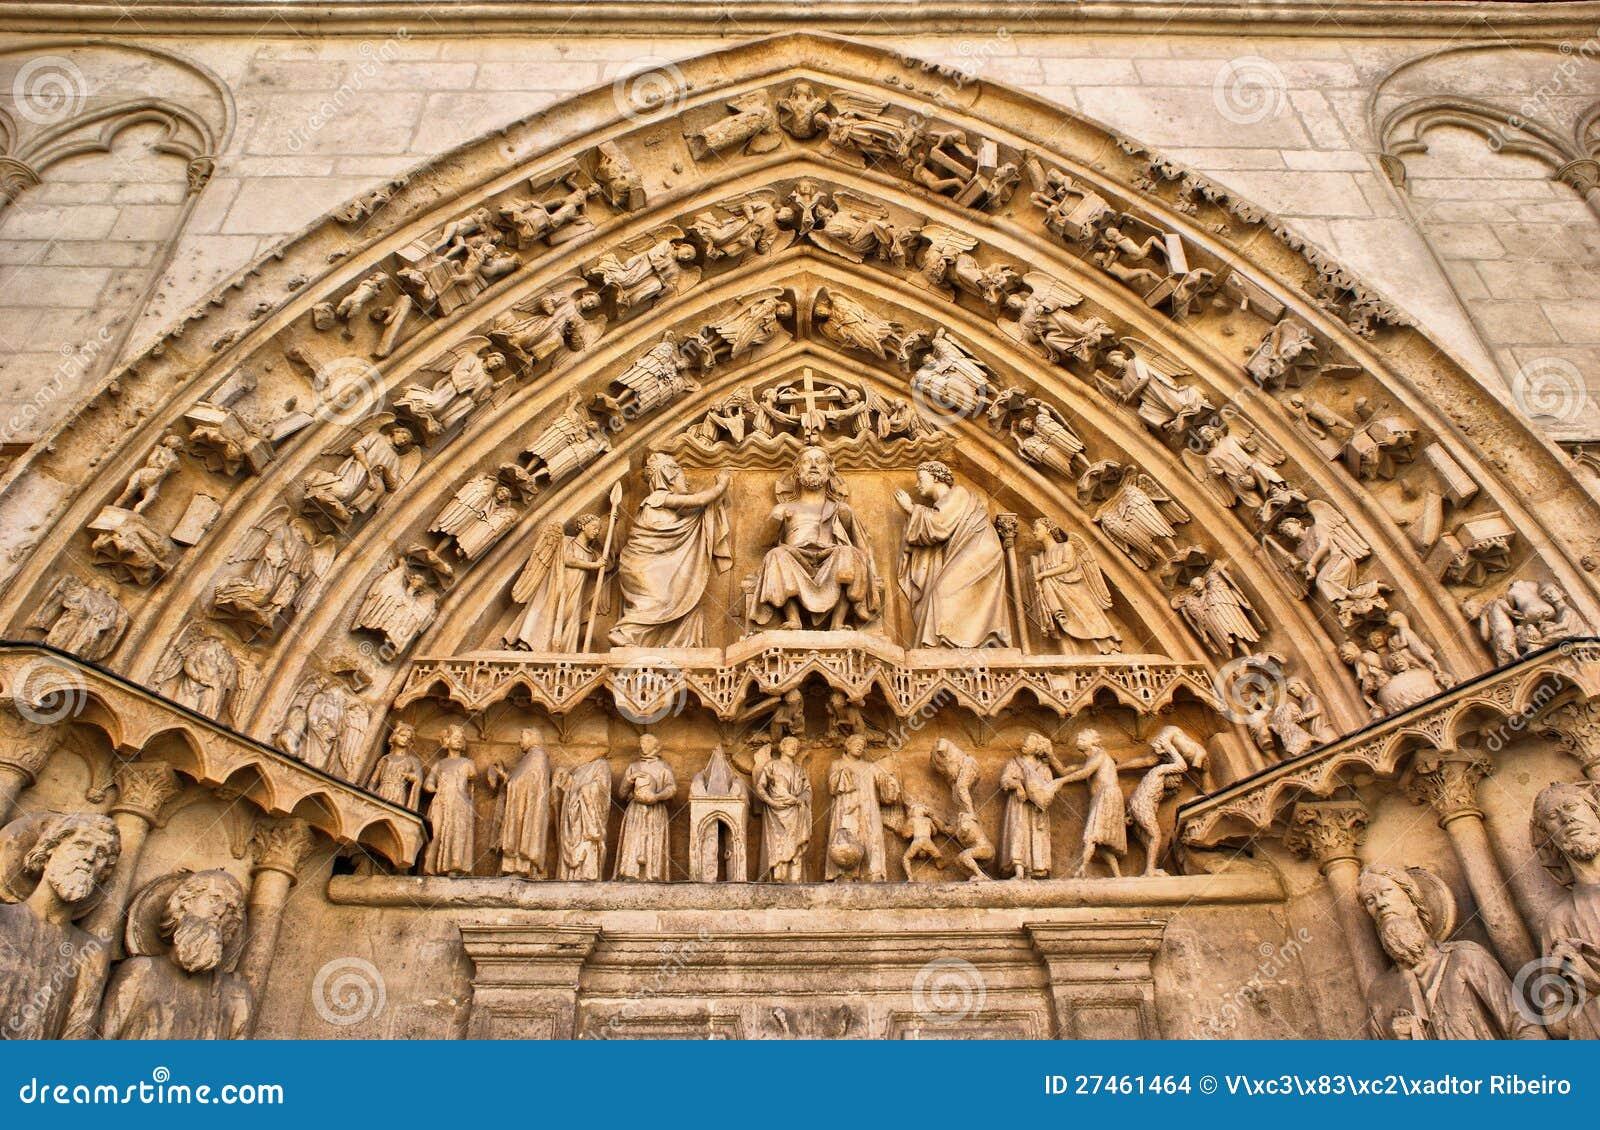 The Coroneria Coronation Door